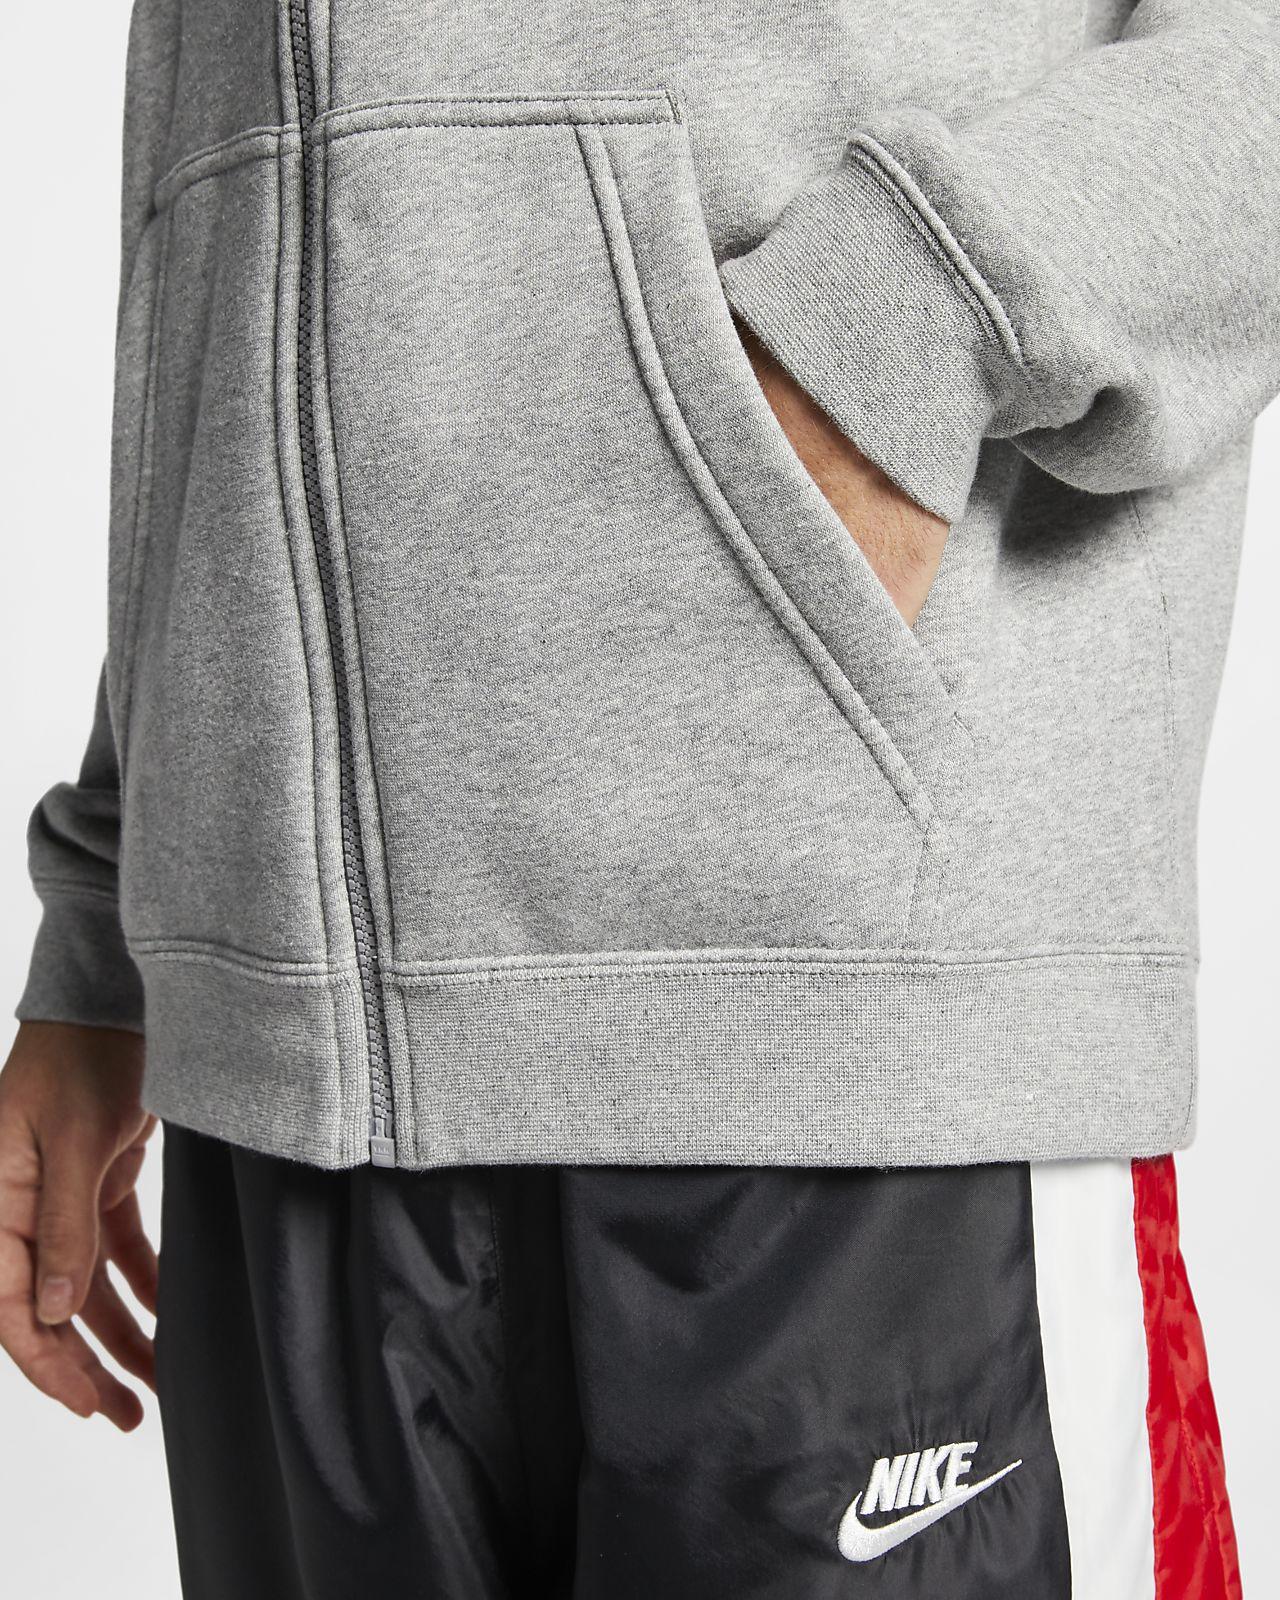 Nike Sportswear Zip Club Hooded Sweatshirt Light Grey//White 804389-063 Large